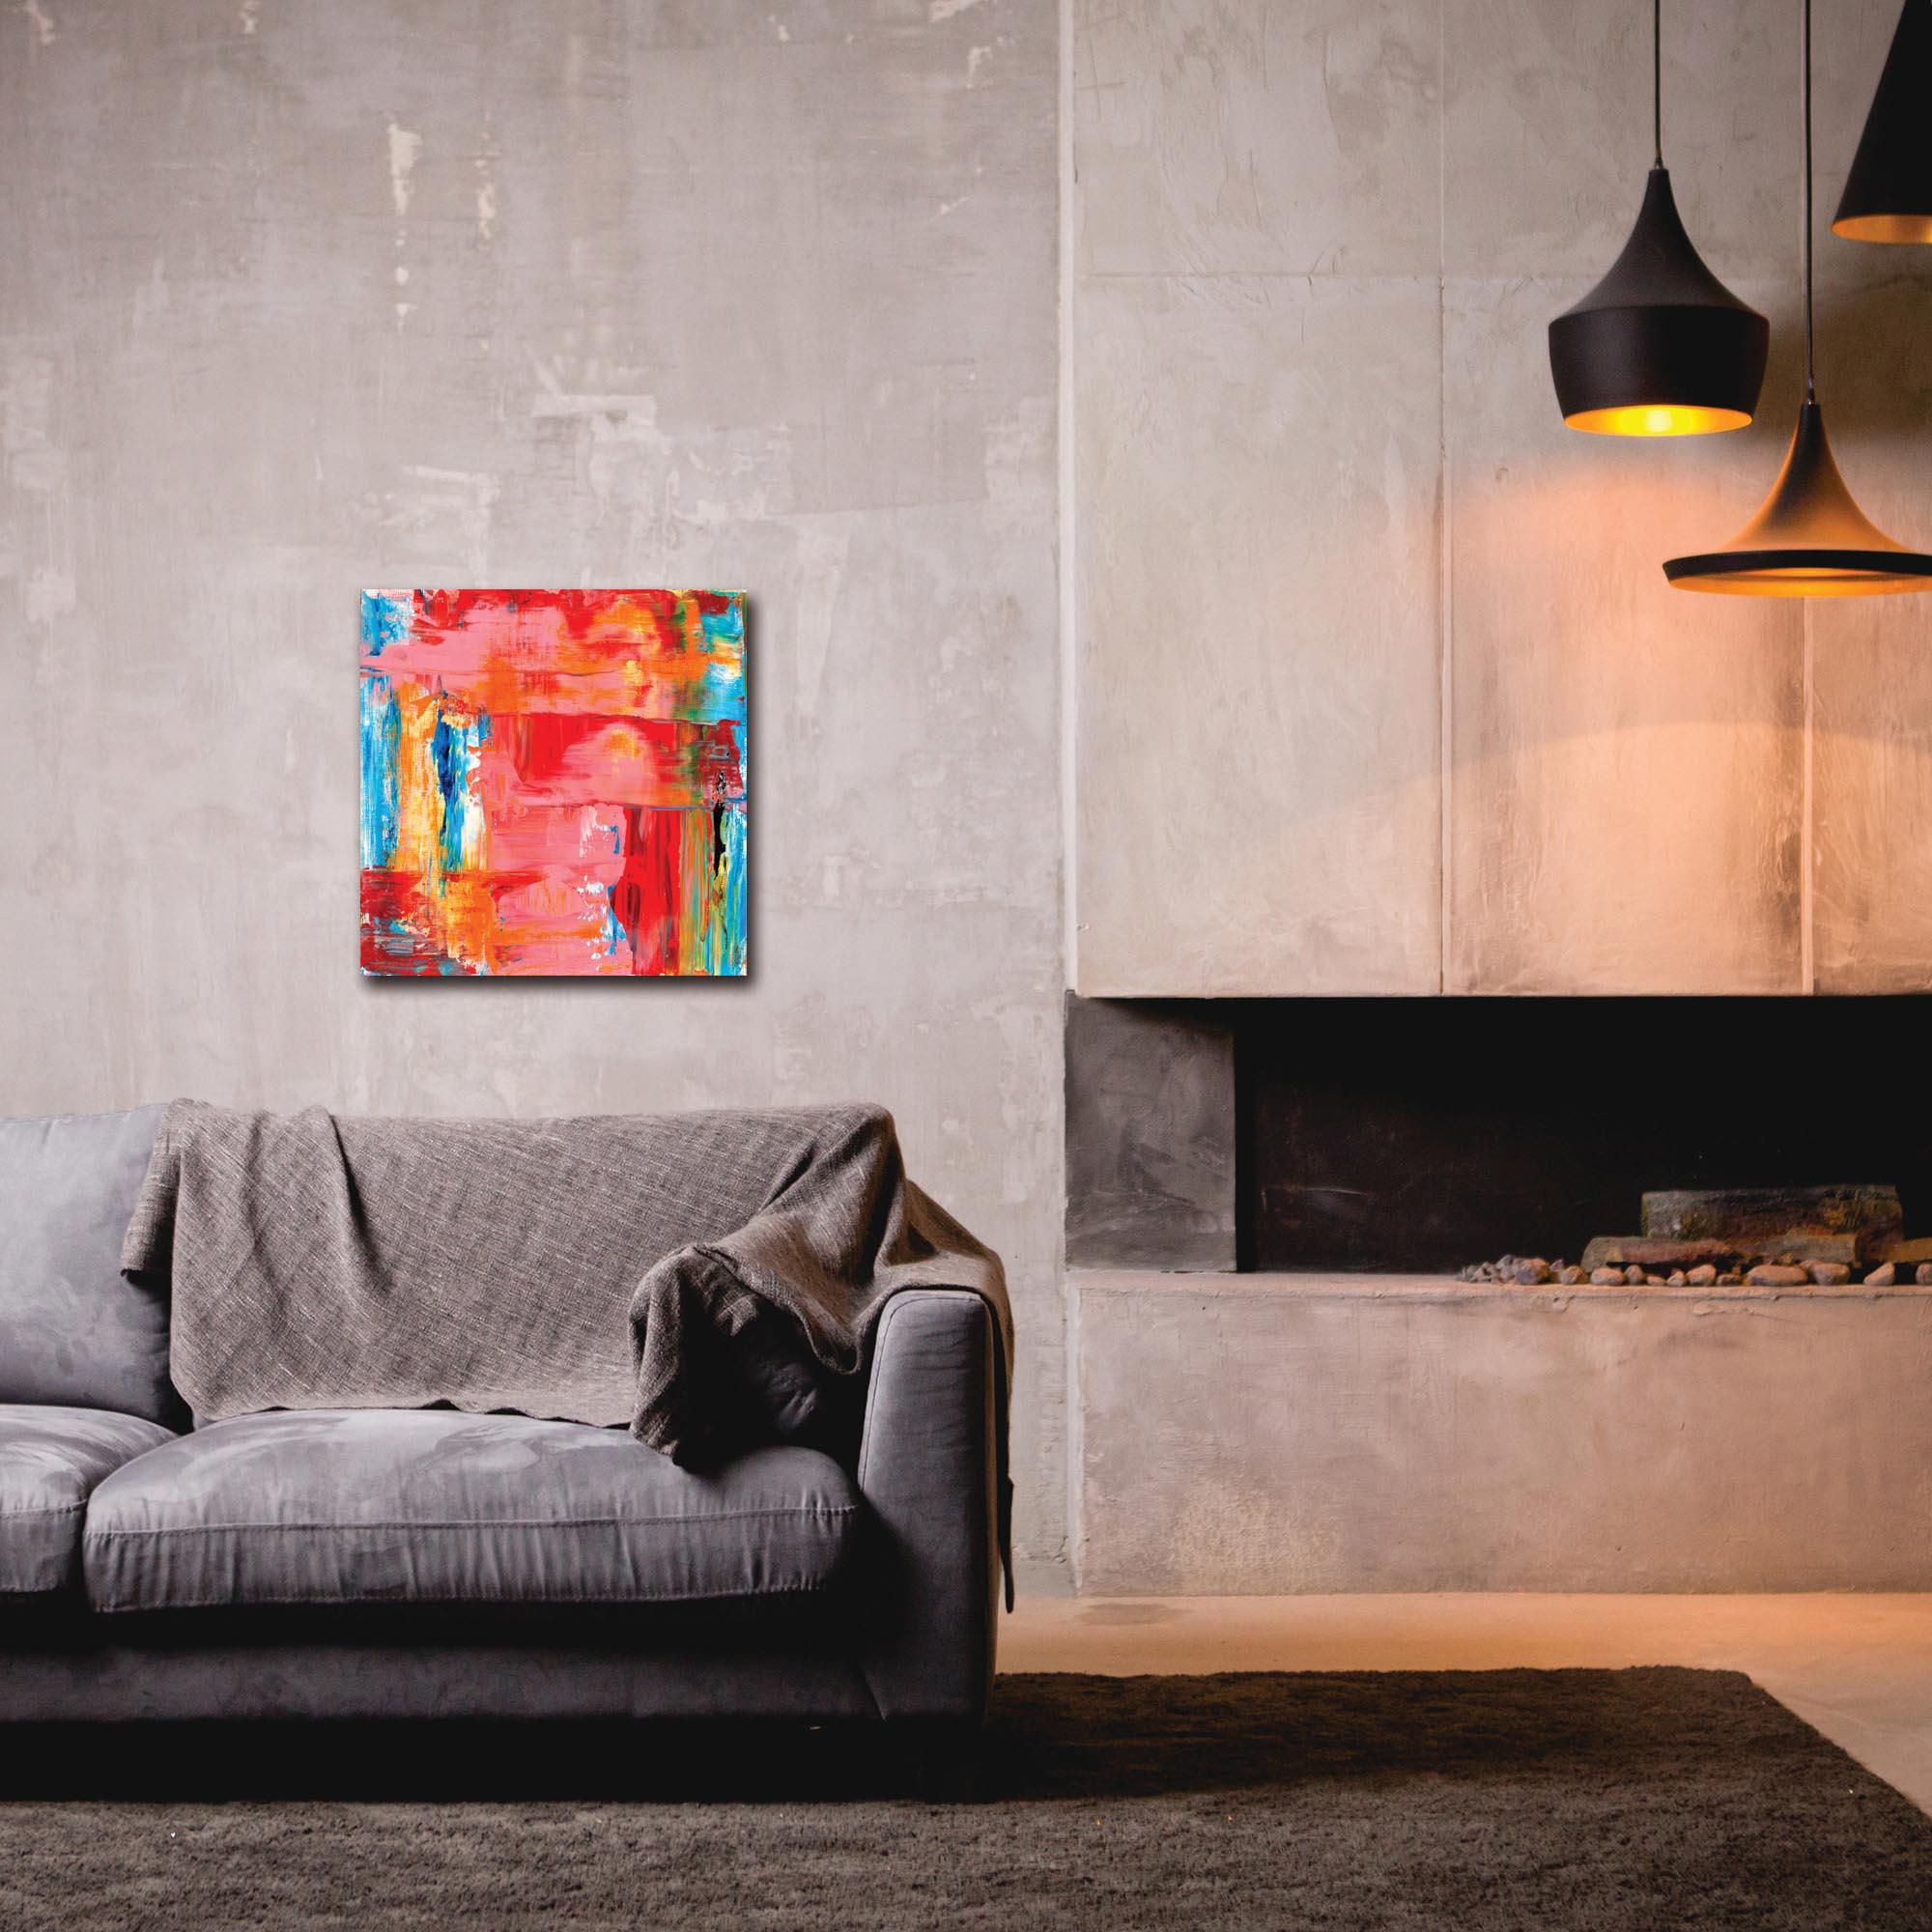 Abstract Wall Art 'Urban Life 1' - Urban Decor on Metal or Plexiglass - Lifestyle View